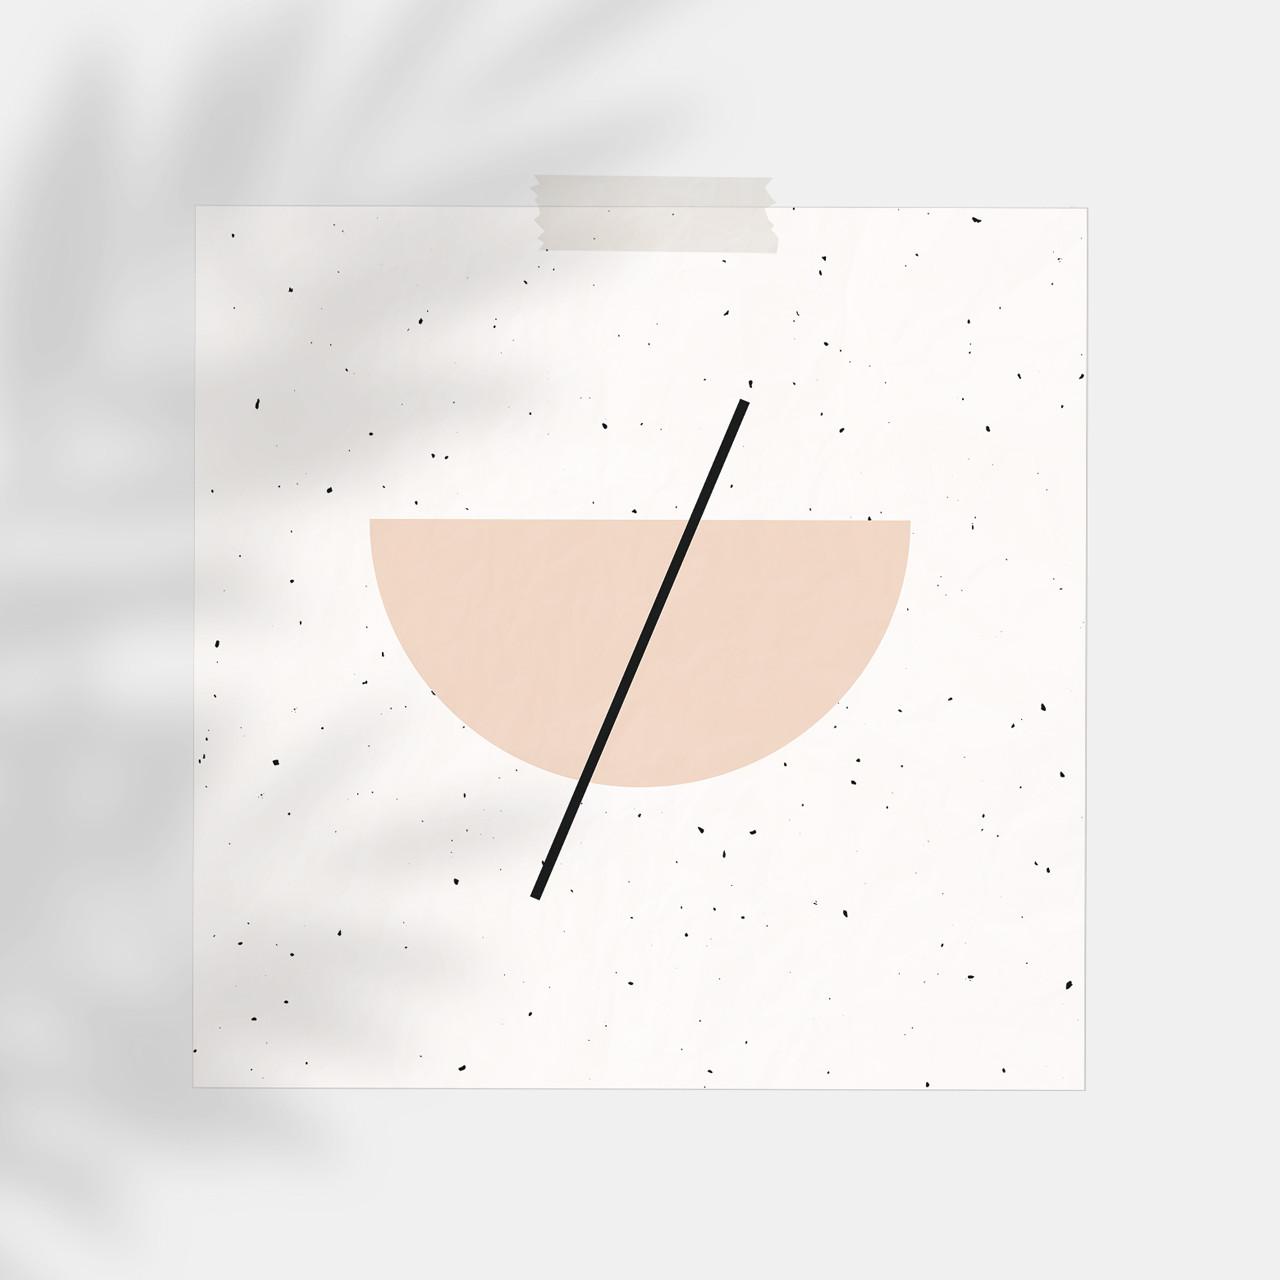 'Half Circle' Minimalist Geometric Art Print from The Printed Home